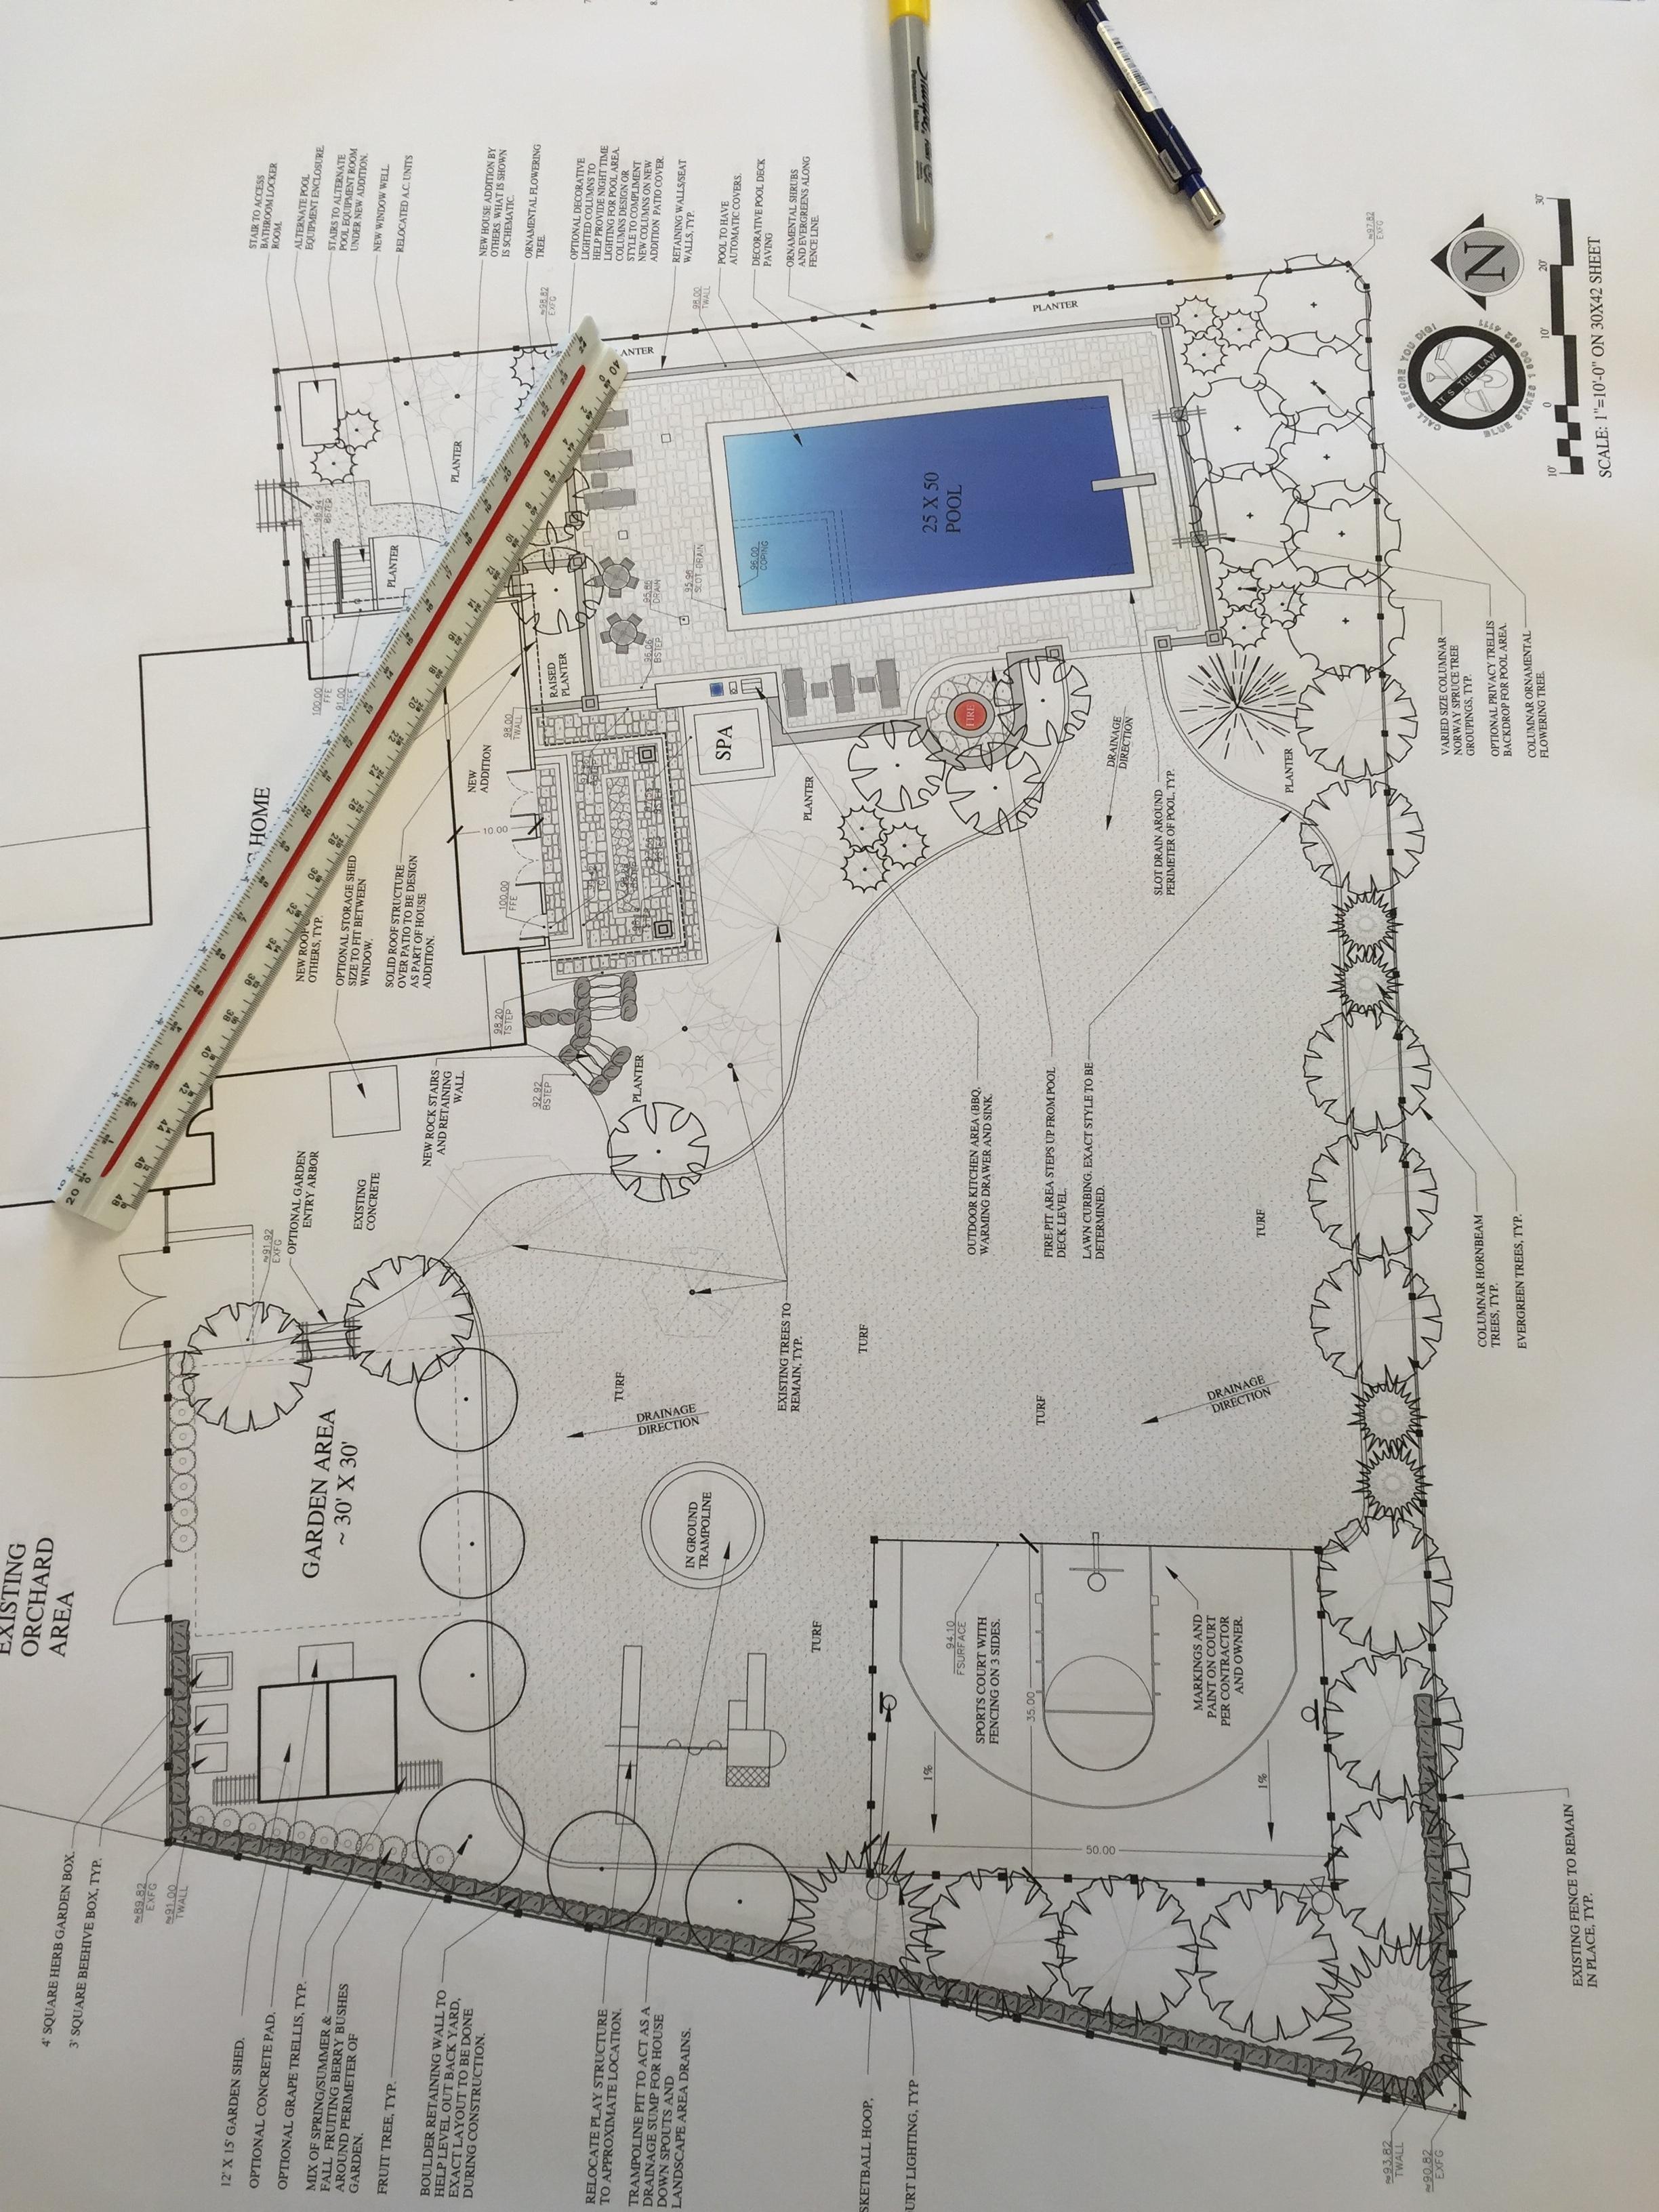 Utah swimming pool and landscape design by Platinum Landscape & Pools.